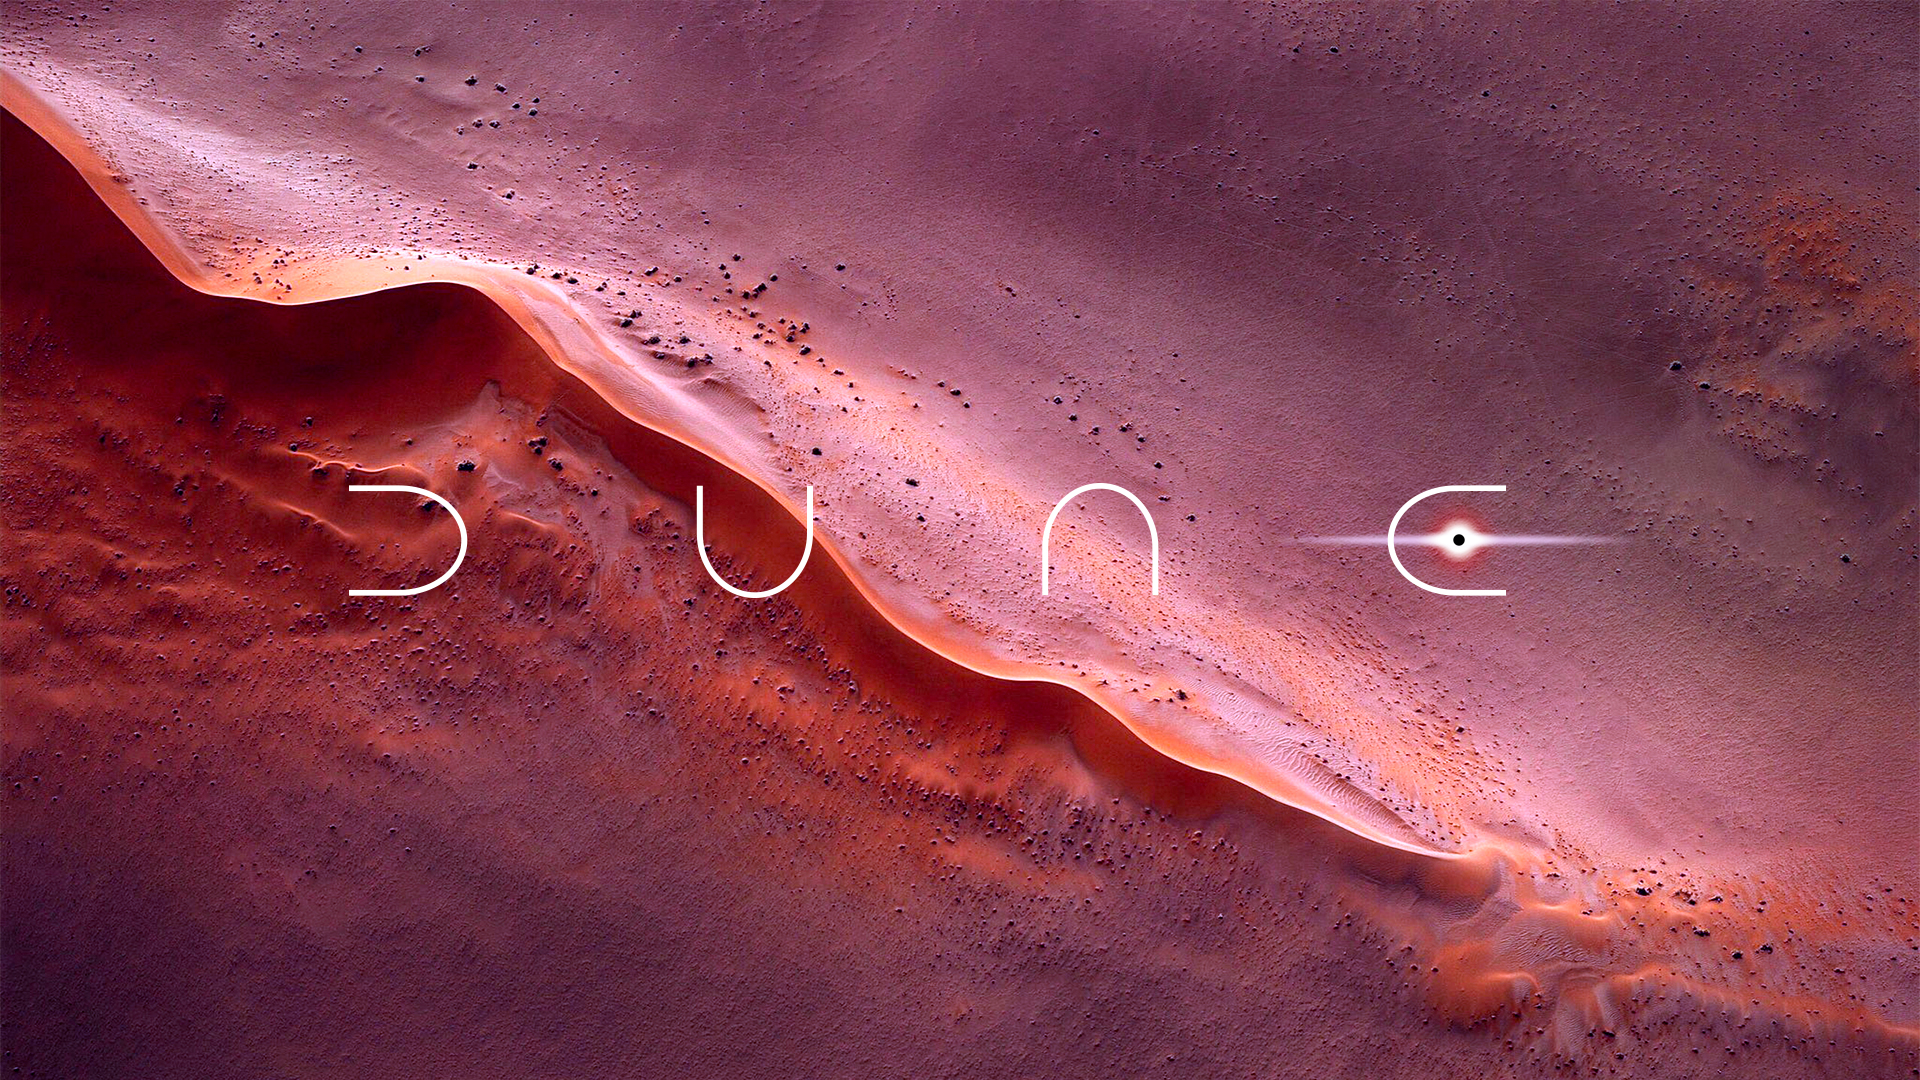 Dune 2020 film logo